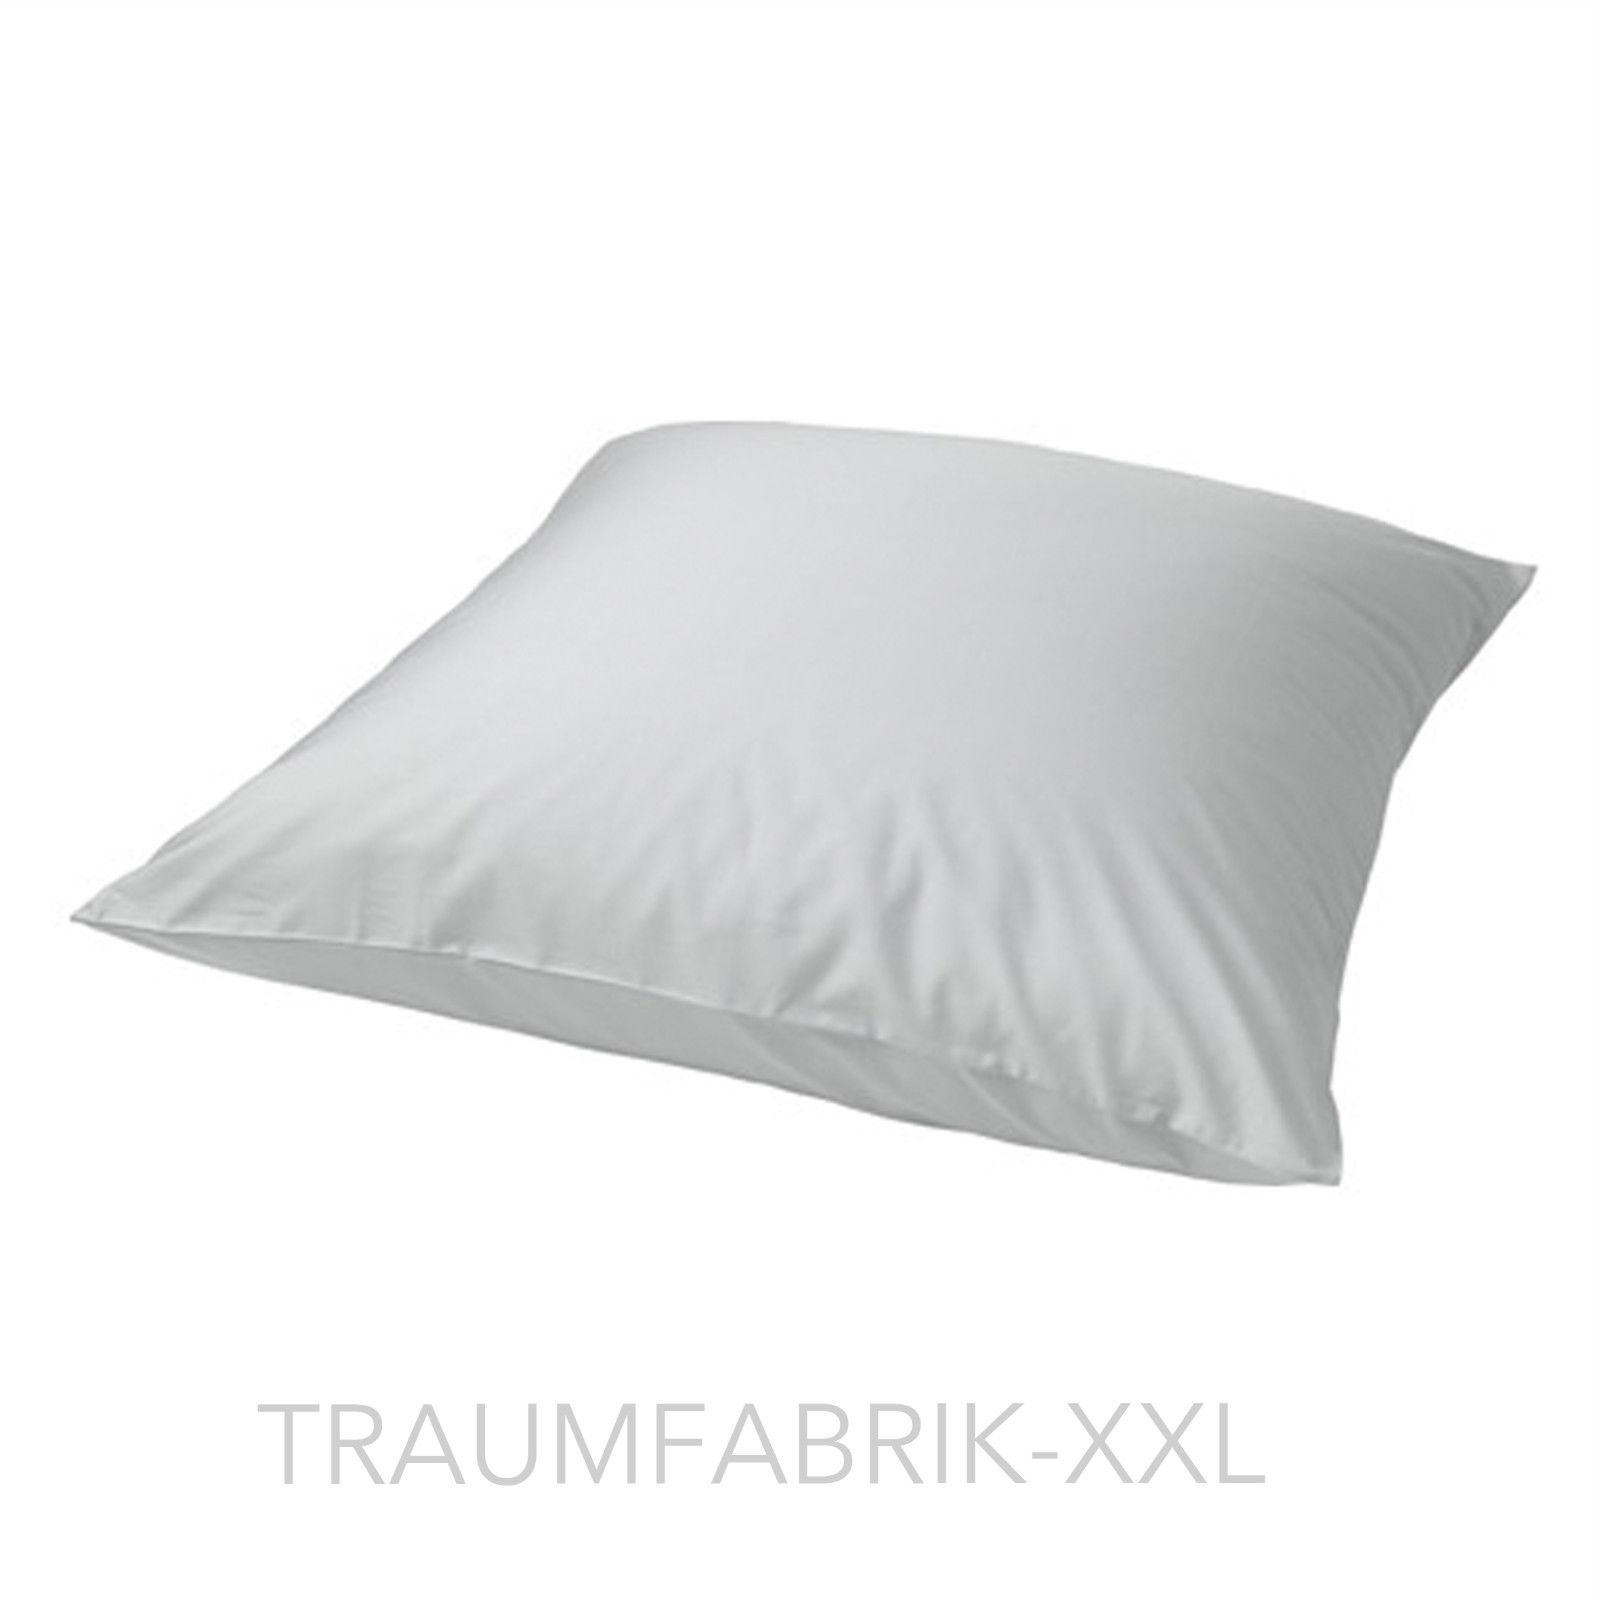 ikea nattjasm kopfkissenbezug 80 80 cm bezug hell grau. Black Bedroom Furniture Sets. Home Design Ideas